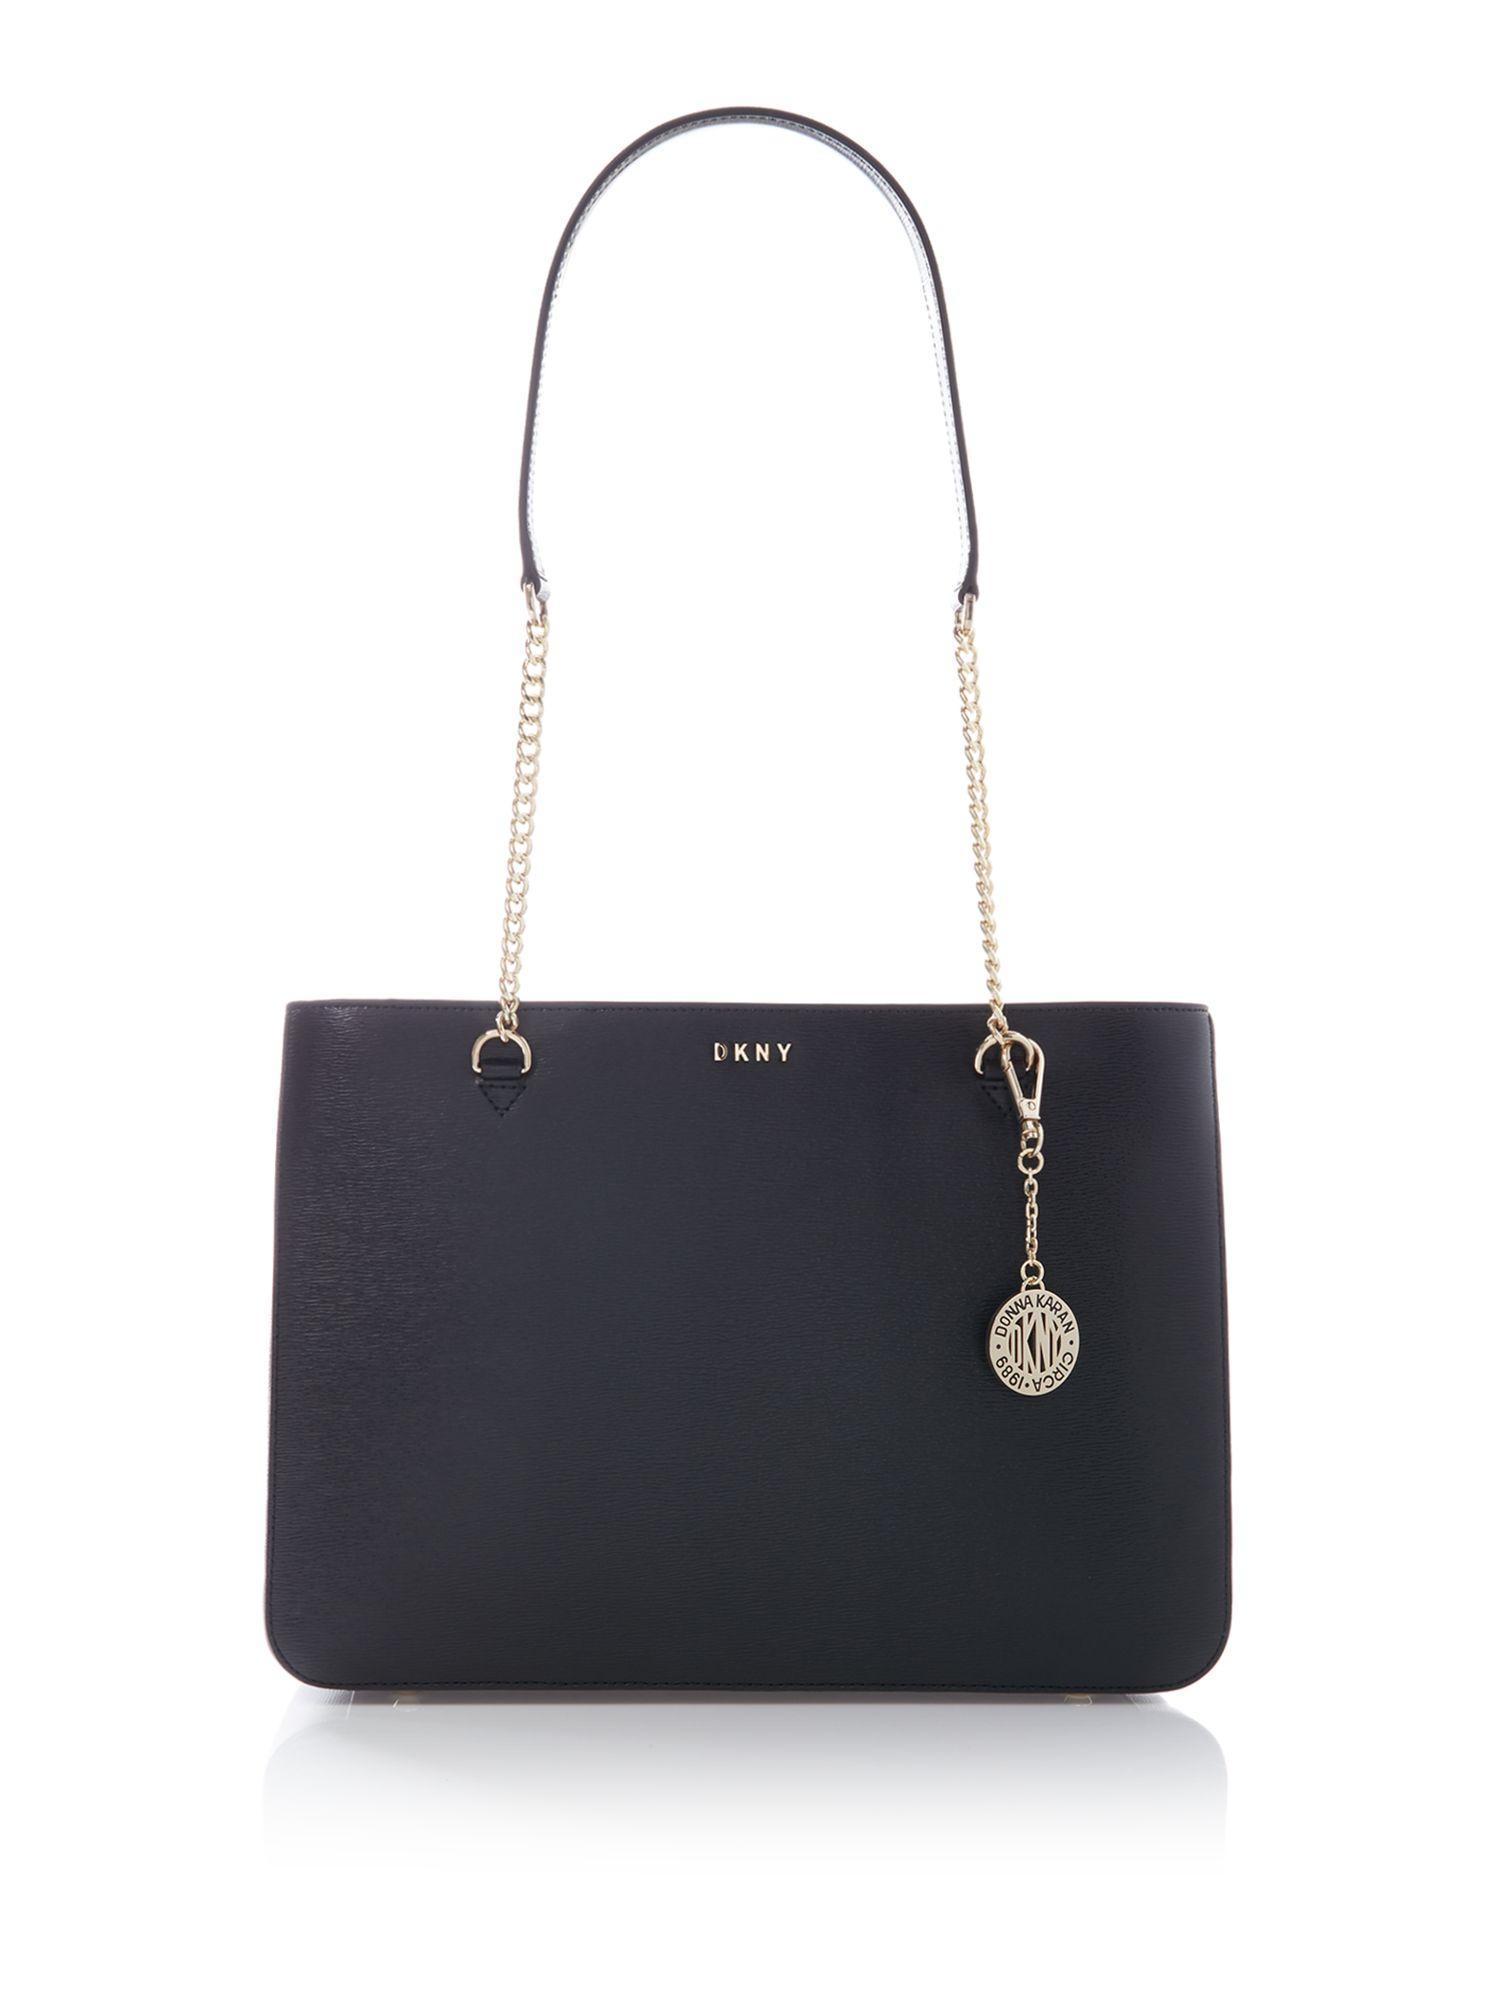 DKNY bags dkny sutton chain shopper ... ZNUWOEV